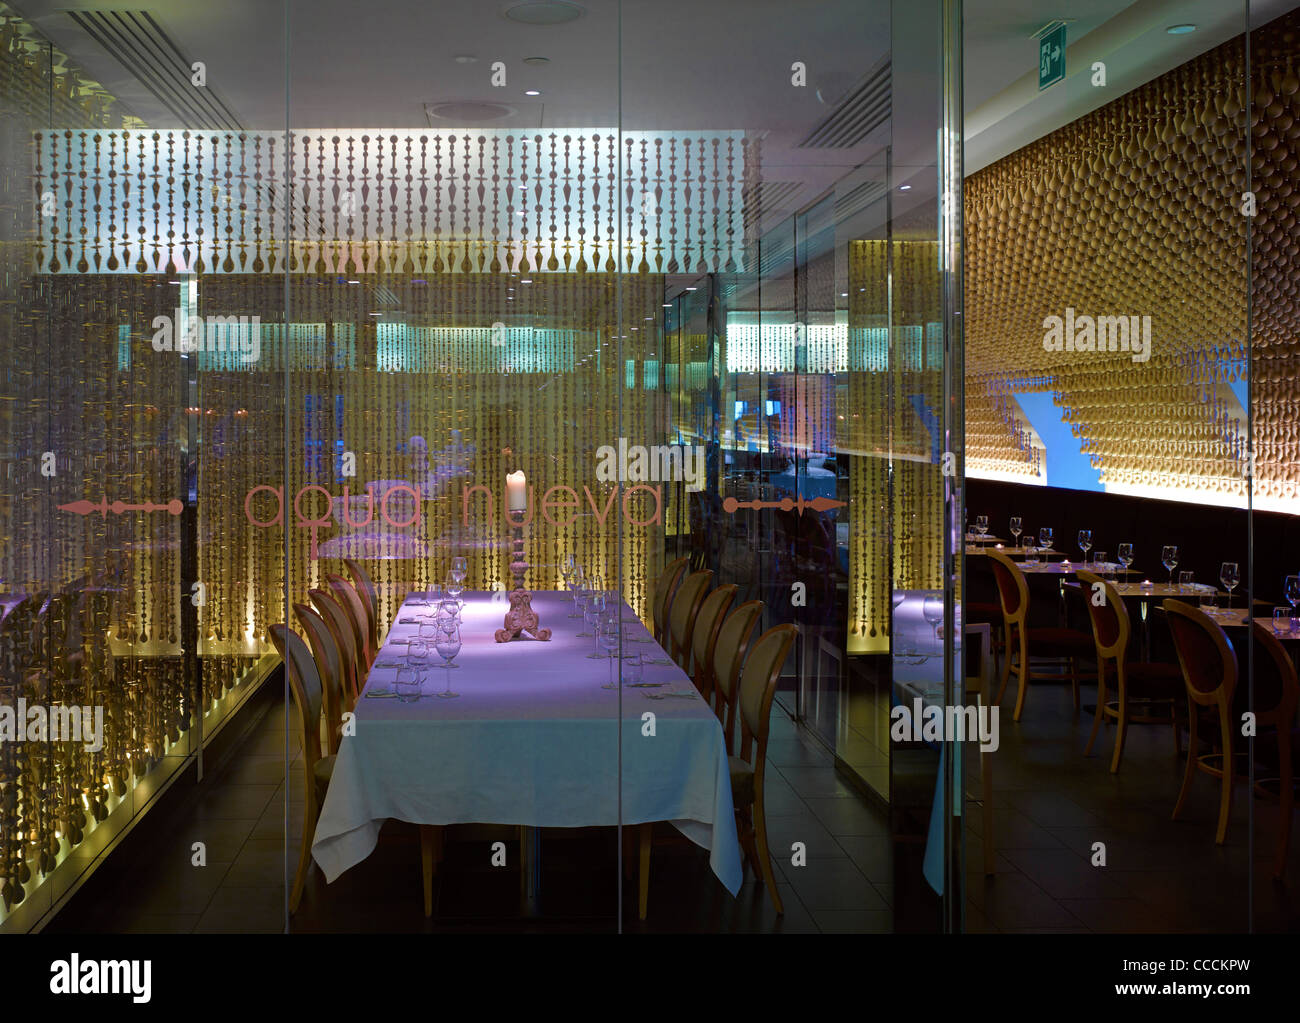 Aqua Restaraunt, London, Glamorous, 2011-private dinning room - Stock Image